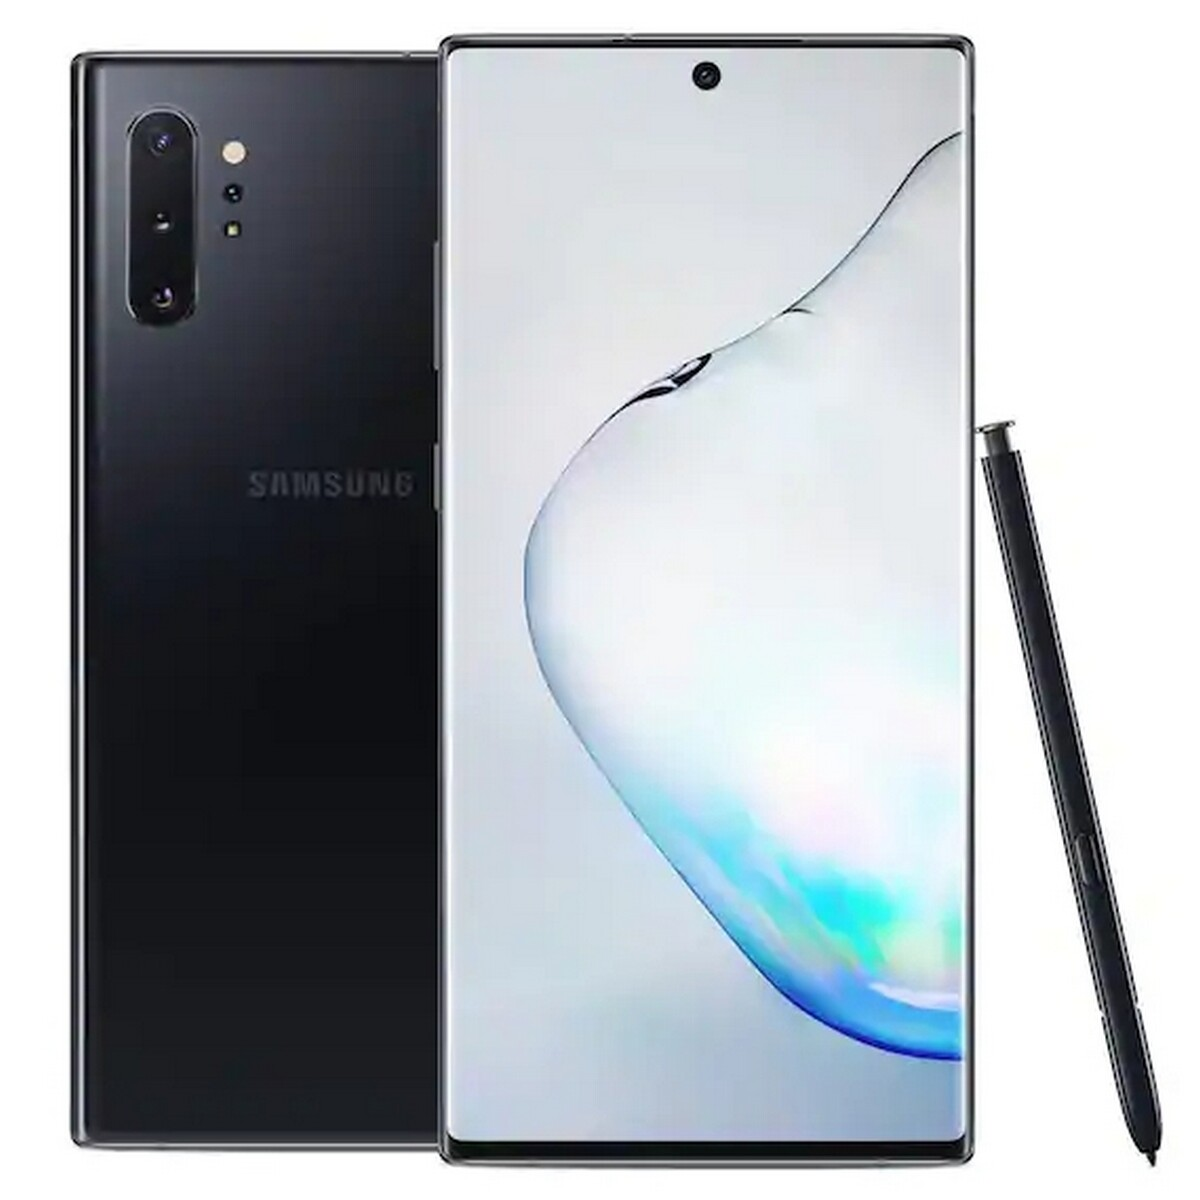 Galaxy Note 10+ (256gb, สี Aura Black) Samsung อุปกรณ์มือถือ แก็ดเจ็ตและไอที /spa.